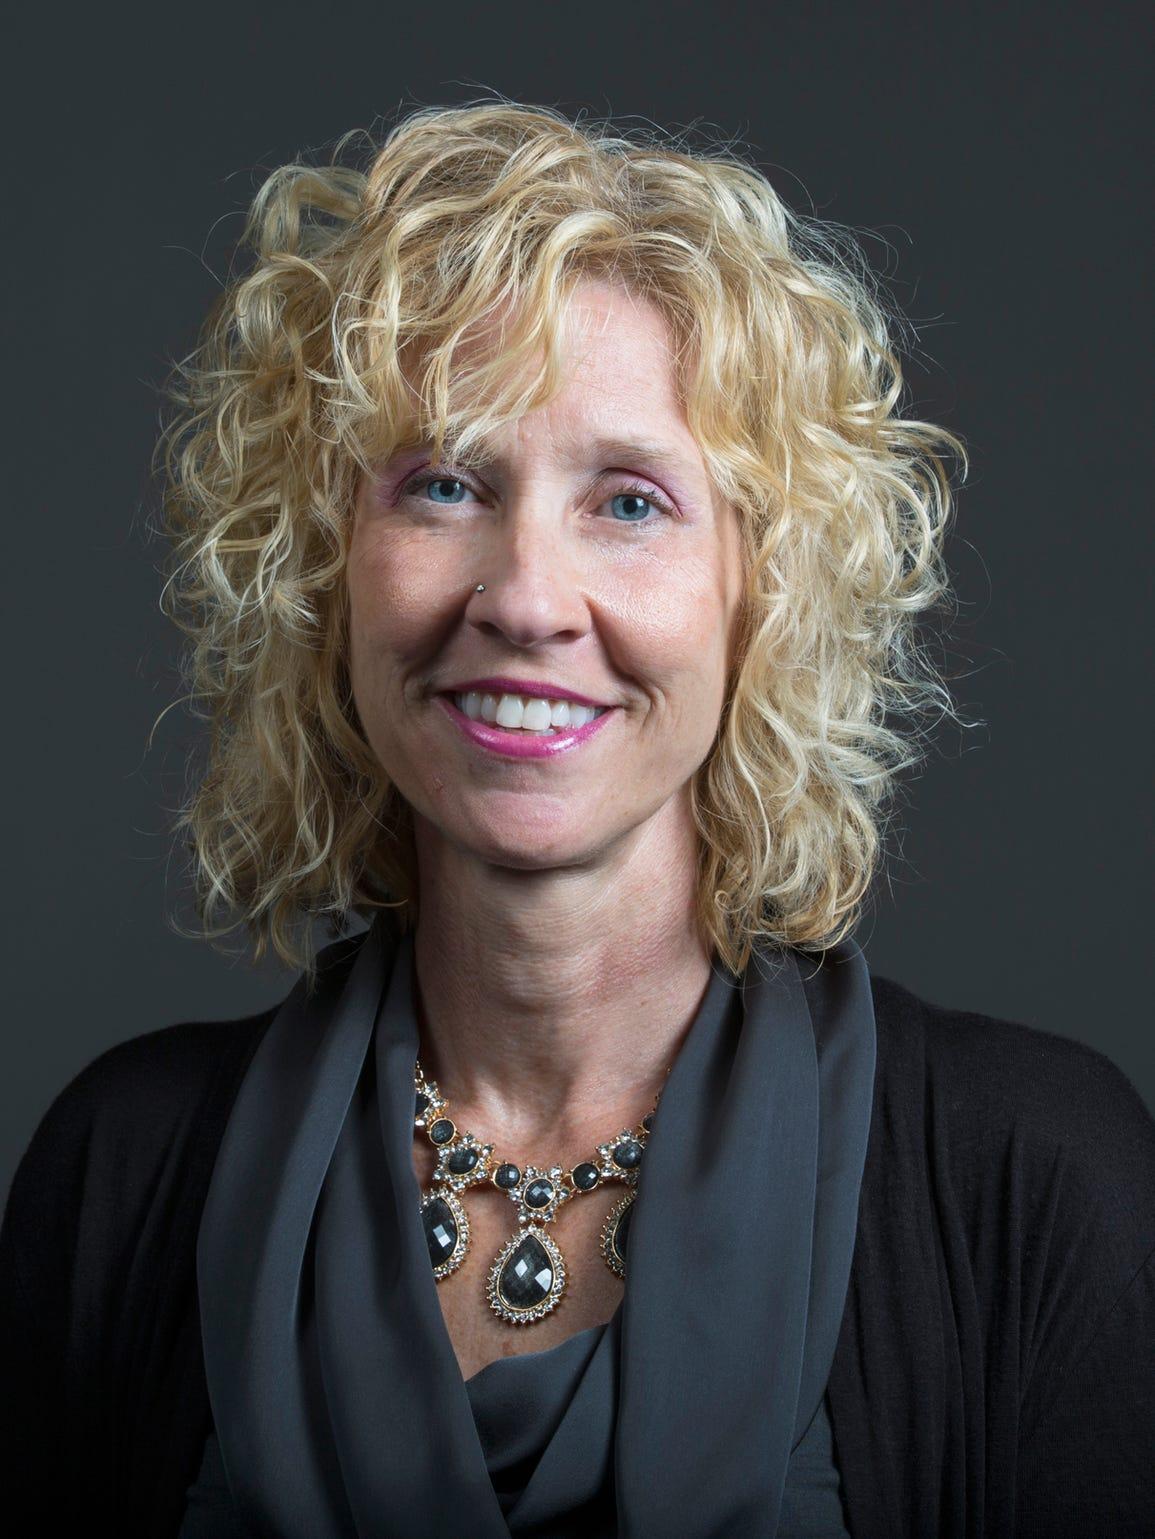 Lisa Olson, Whitnall School District Superintendent